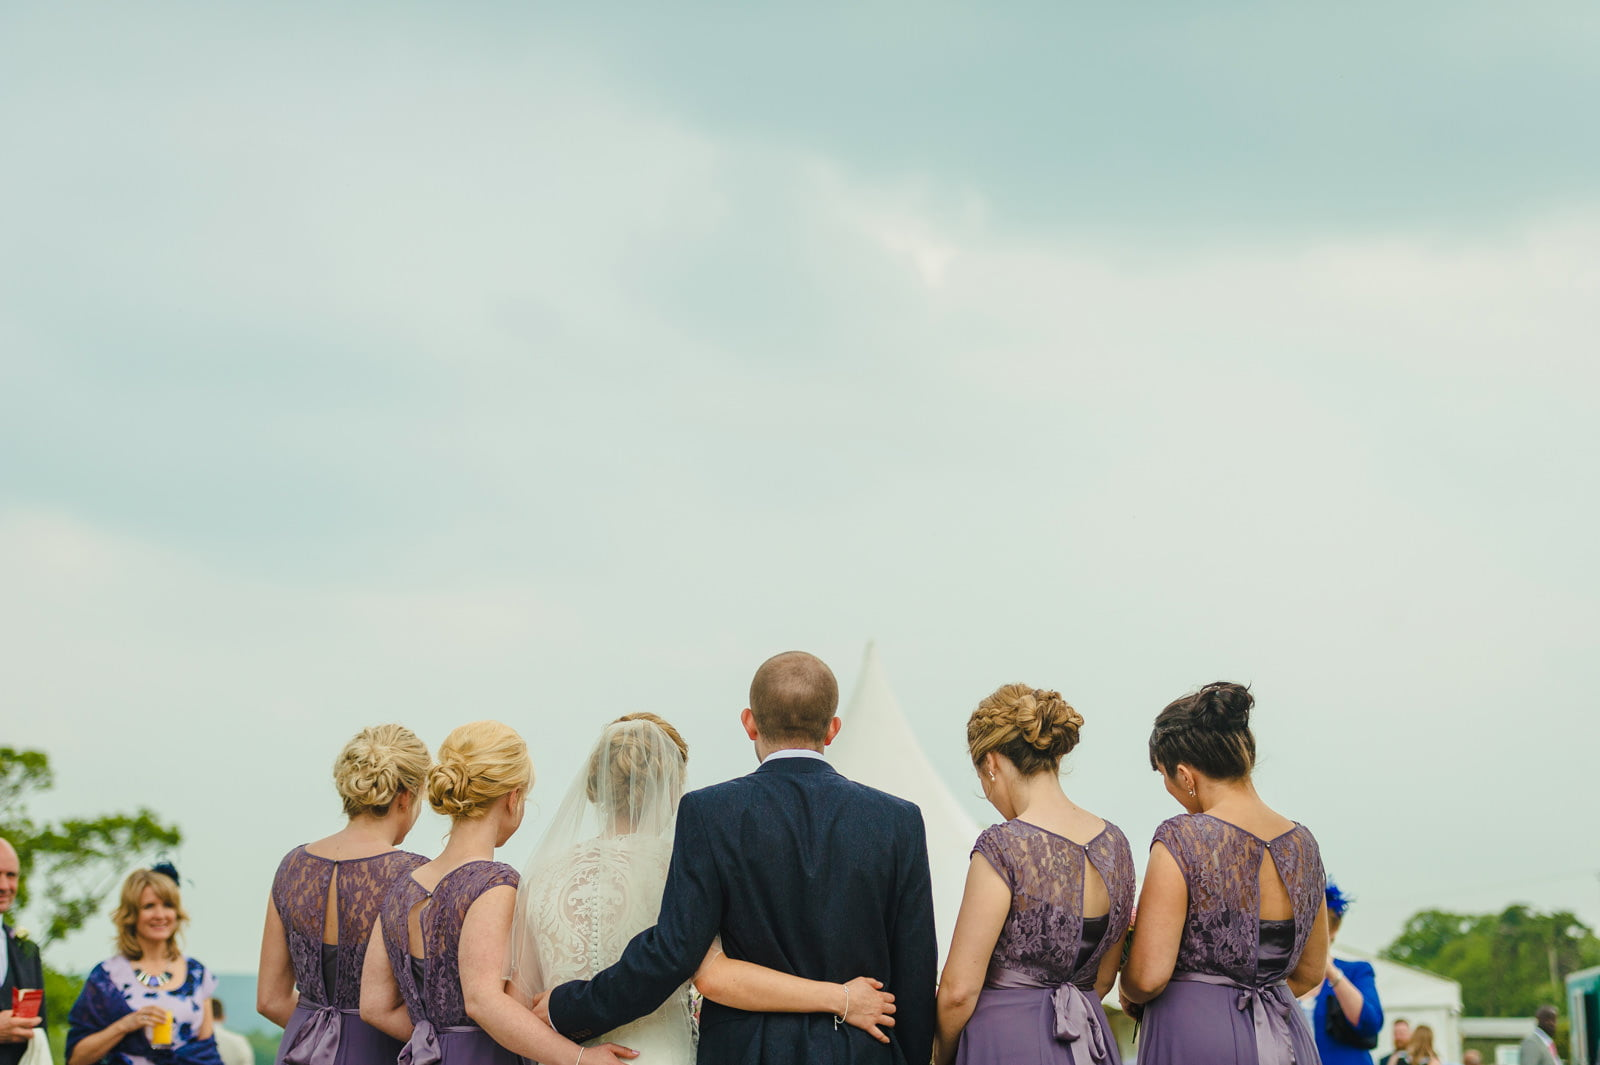 Millers Of Netley wedding, Dorrington, Shrewsbury | Emma + Ben 63